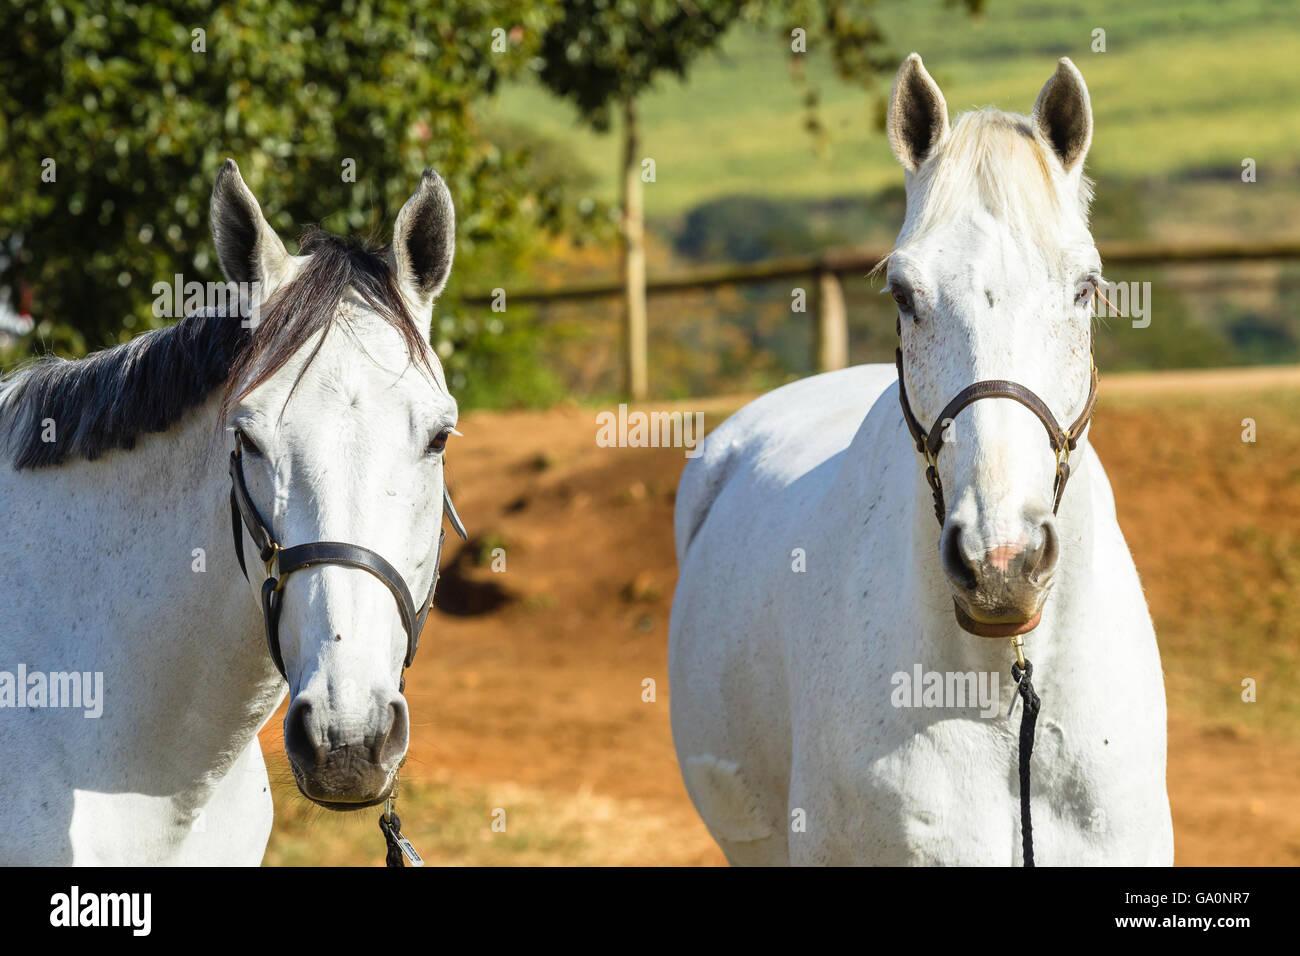 Horse closeup portrait of equestrian pony animals - Stock Image